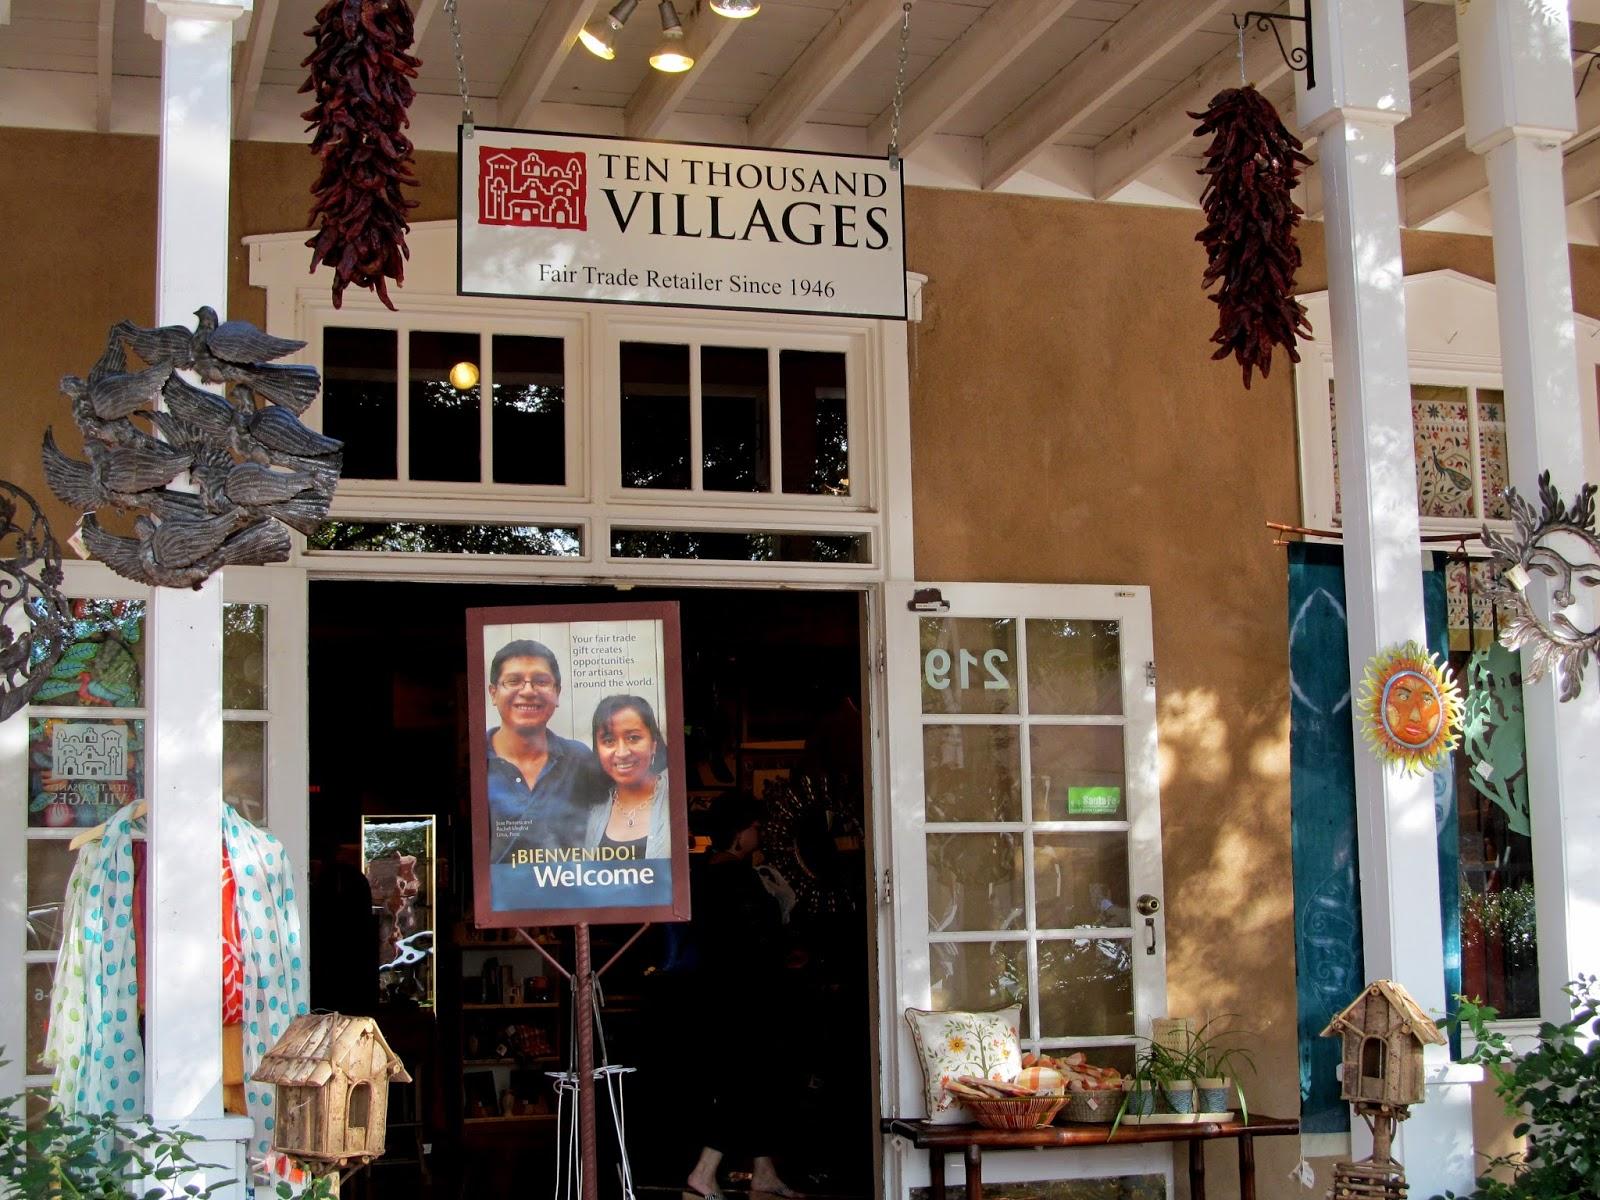 Bread New Mexico Blog: Fair Trade in Santa Fe (Part 2) The